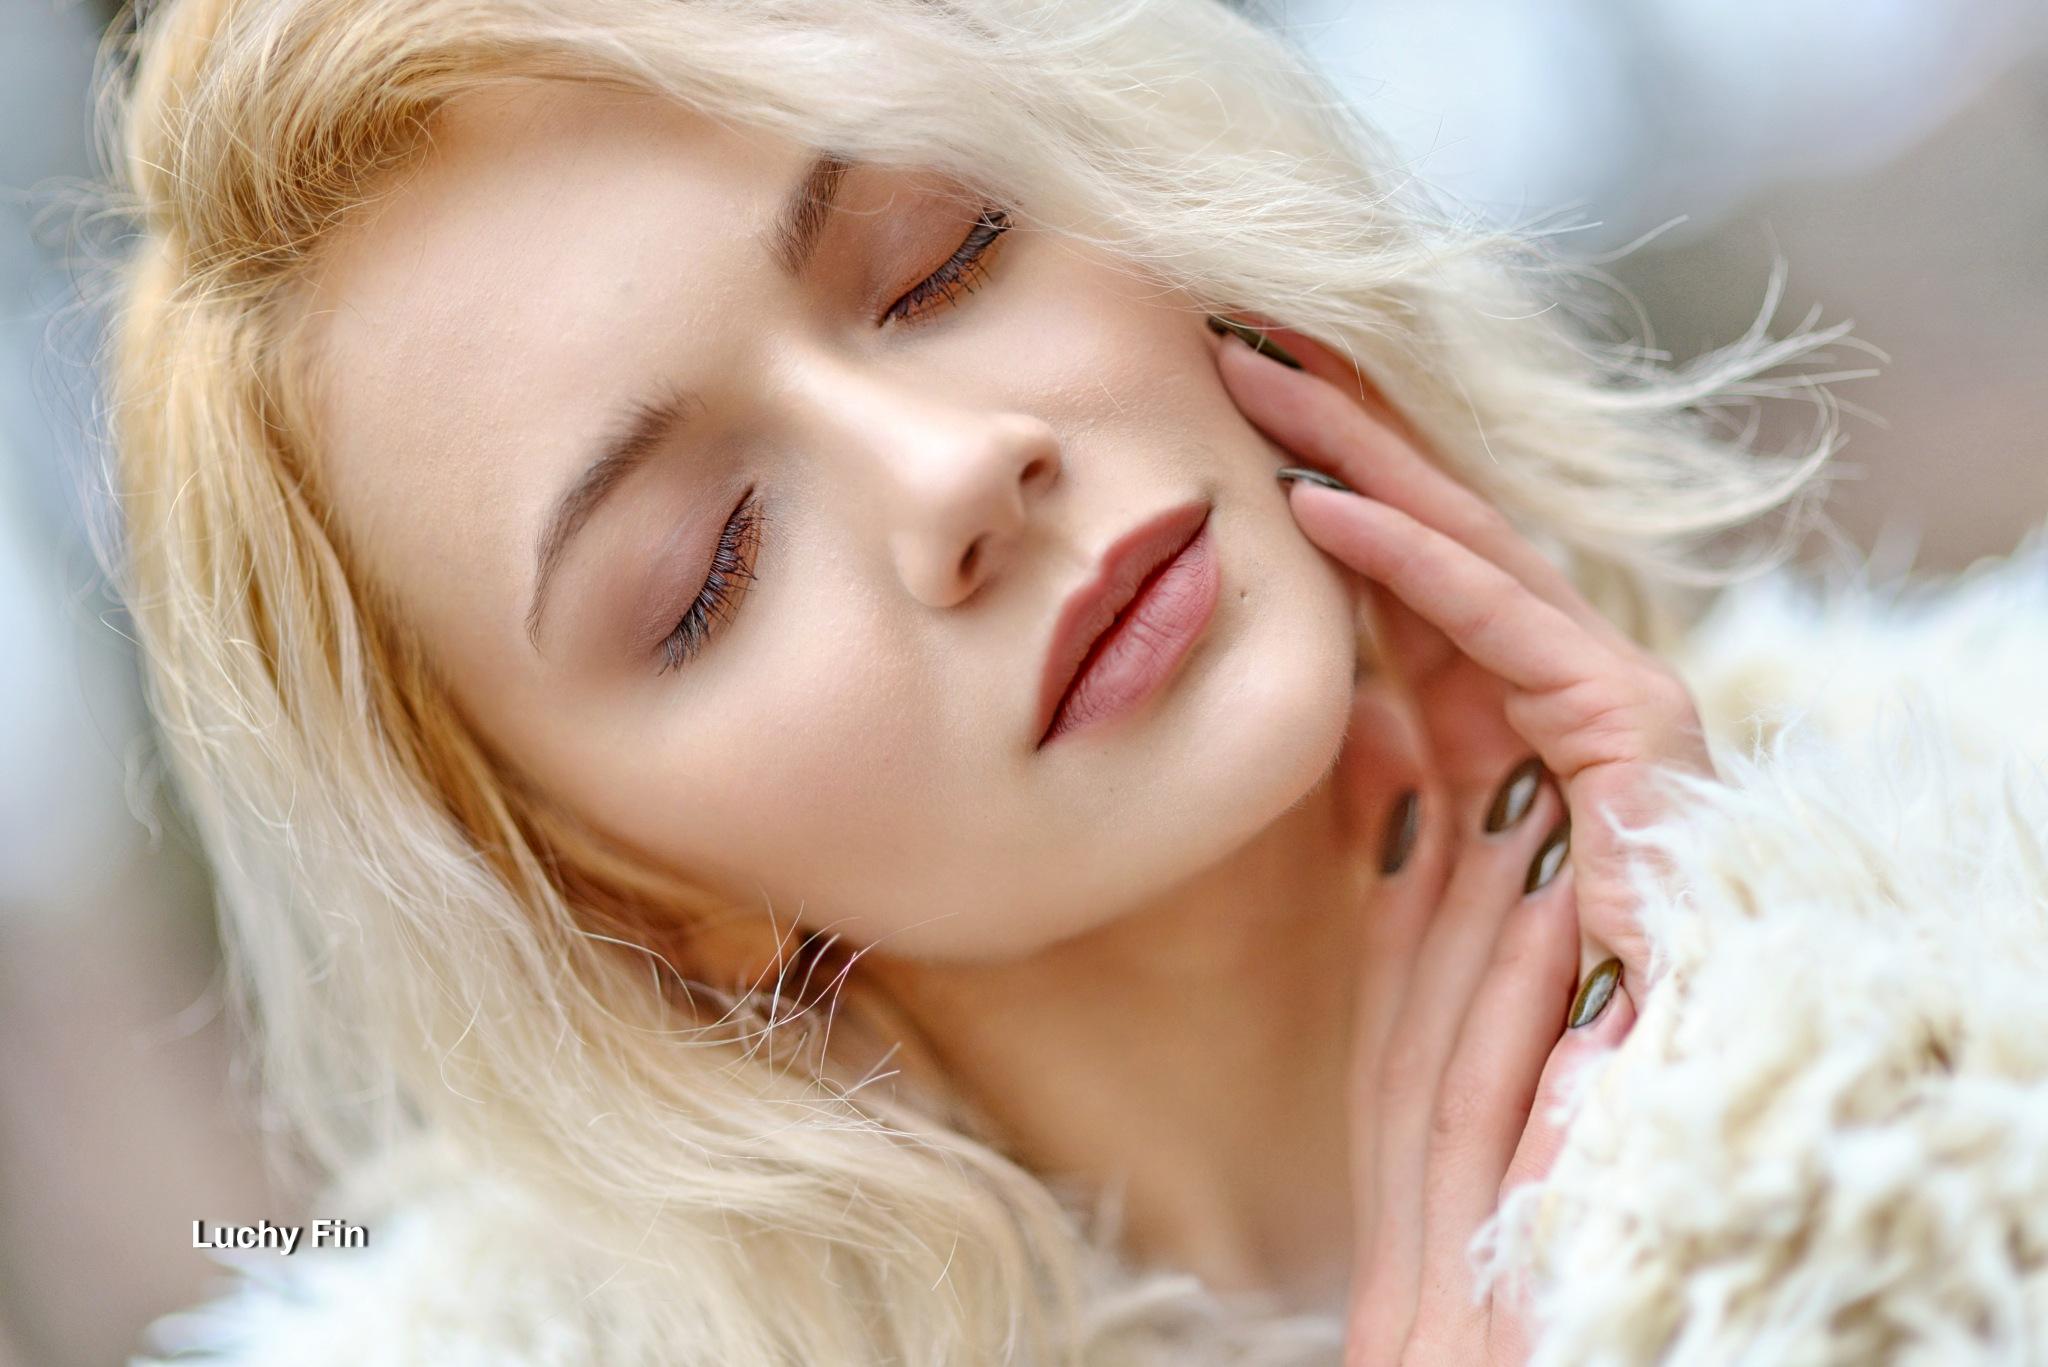 Carla softness by Luchy Fin